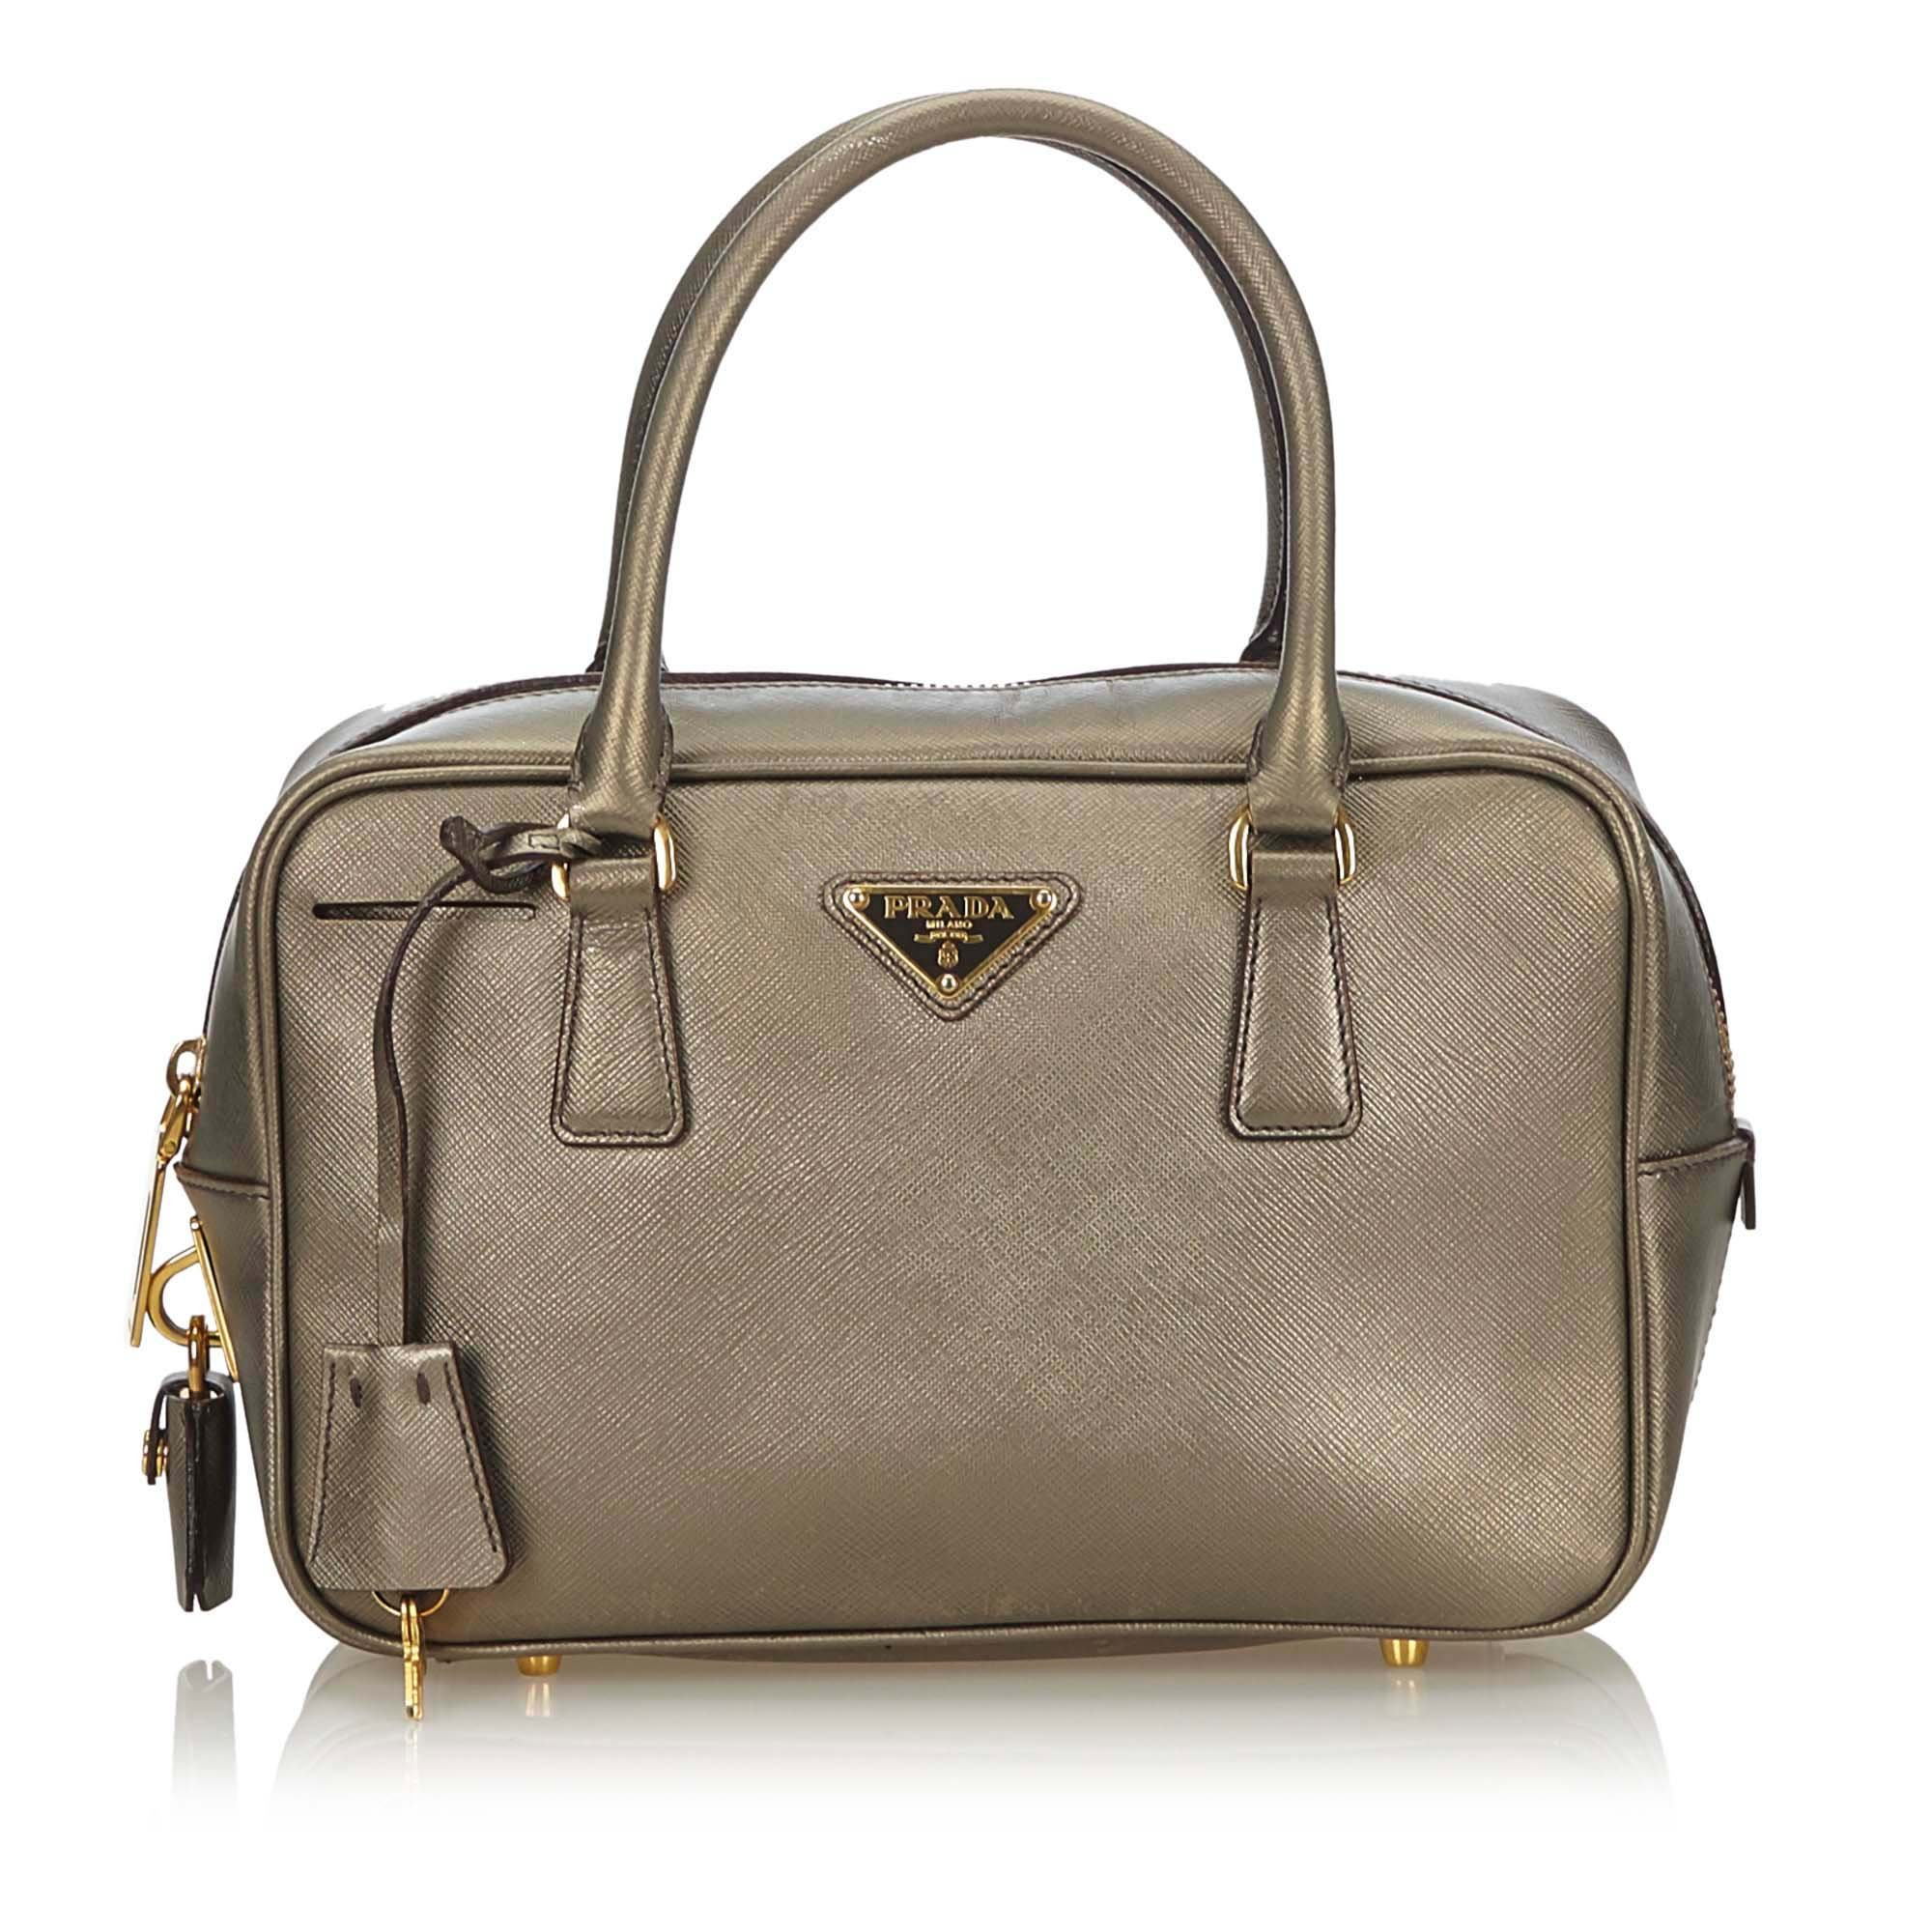 PRADA Bauletto Saffiano Lux Väskor